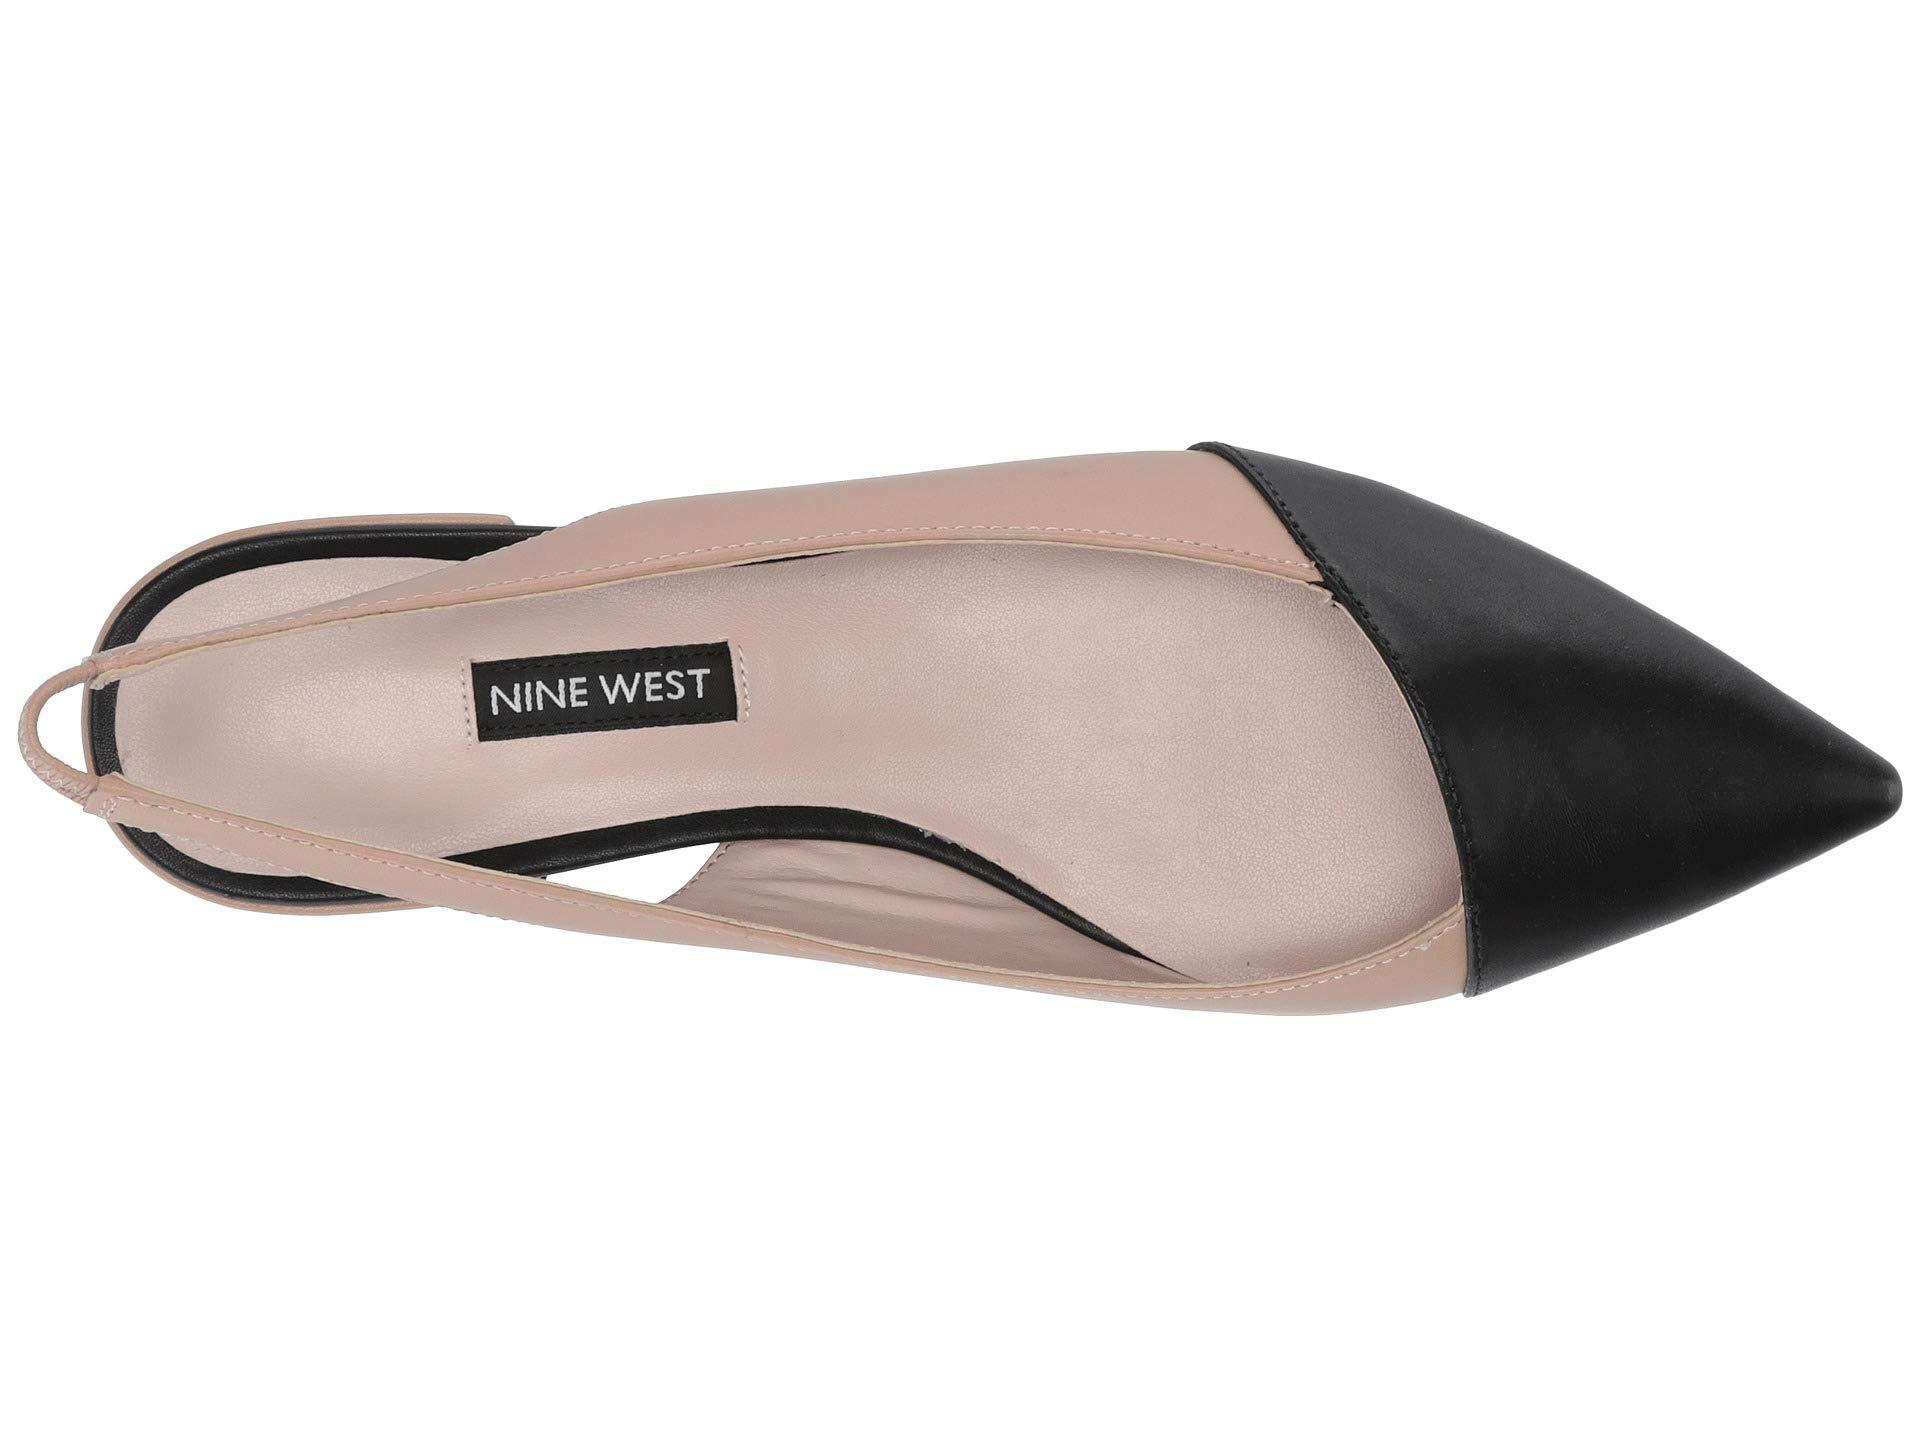 a09aca47e0a2 Lyst - Nine West Forlove Flat (black black) Women s Shoes in Black